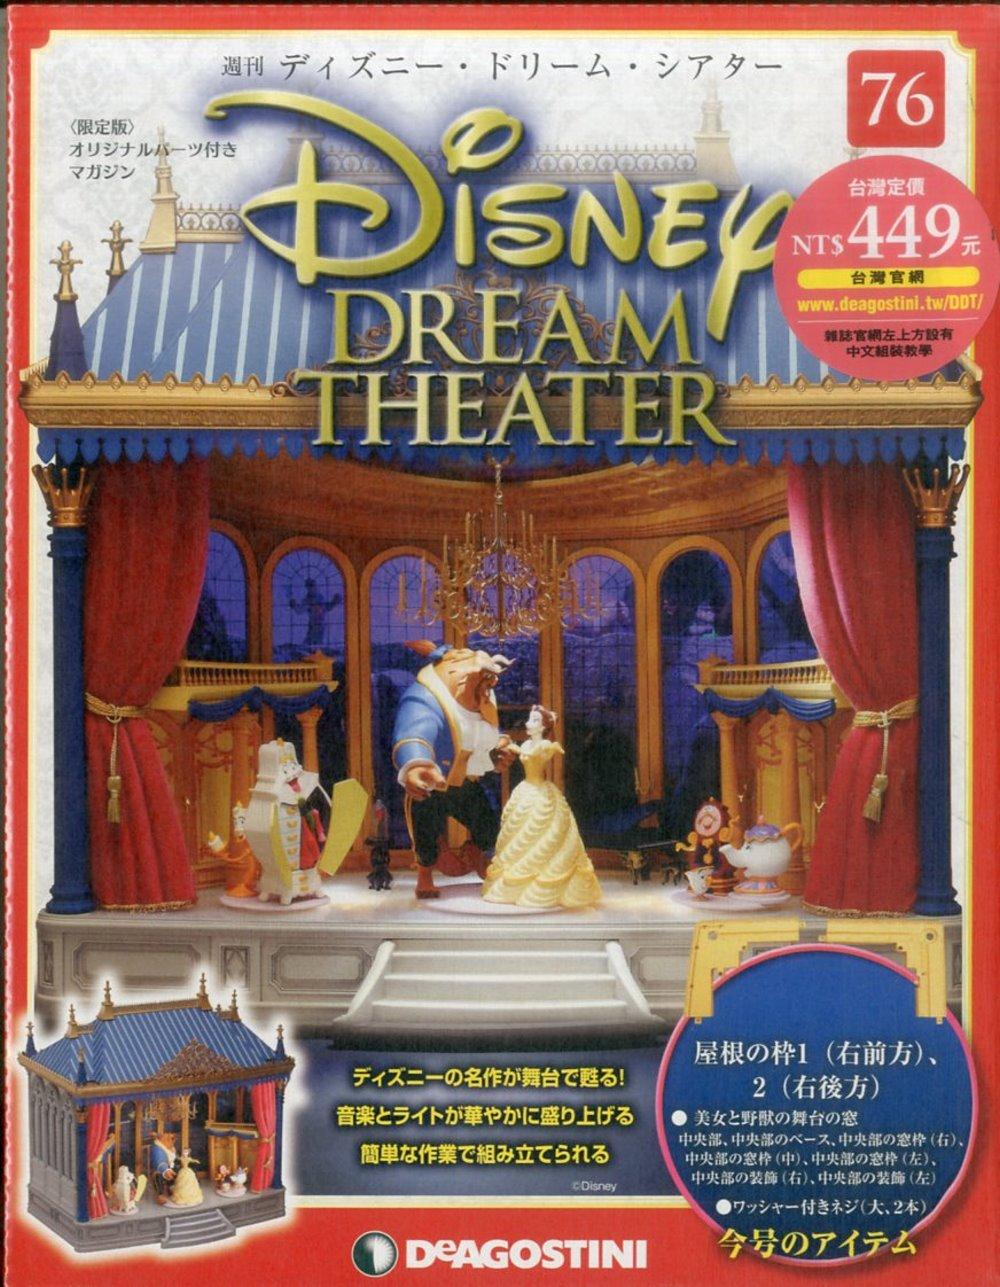 Disney Dream Theater 迪士尼夢幻劇場 (日文版) 2018/4/10第76期